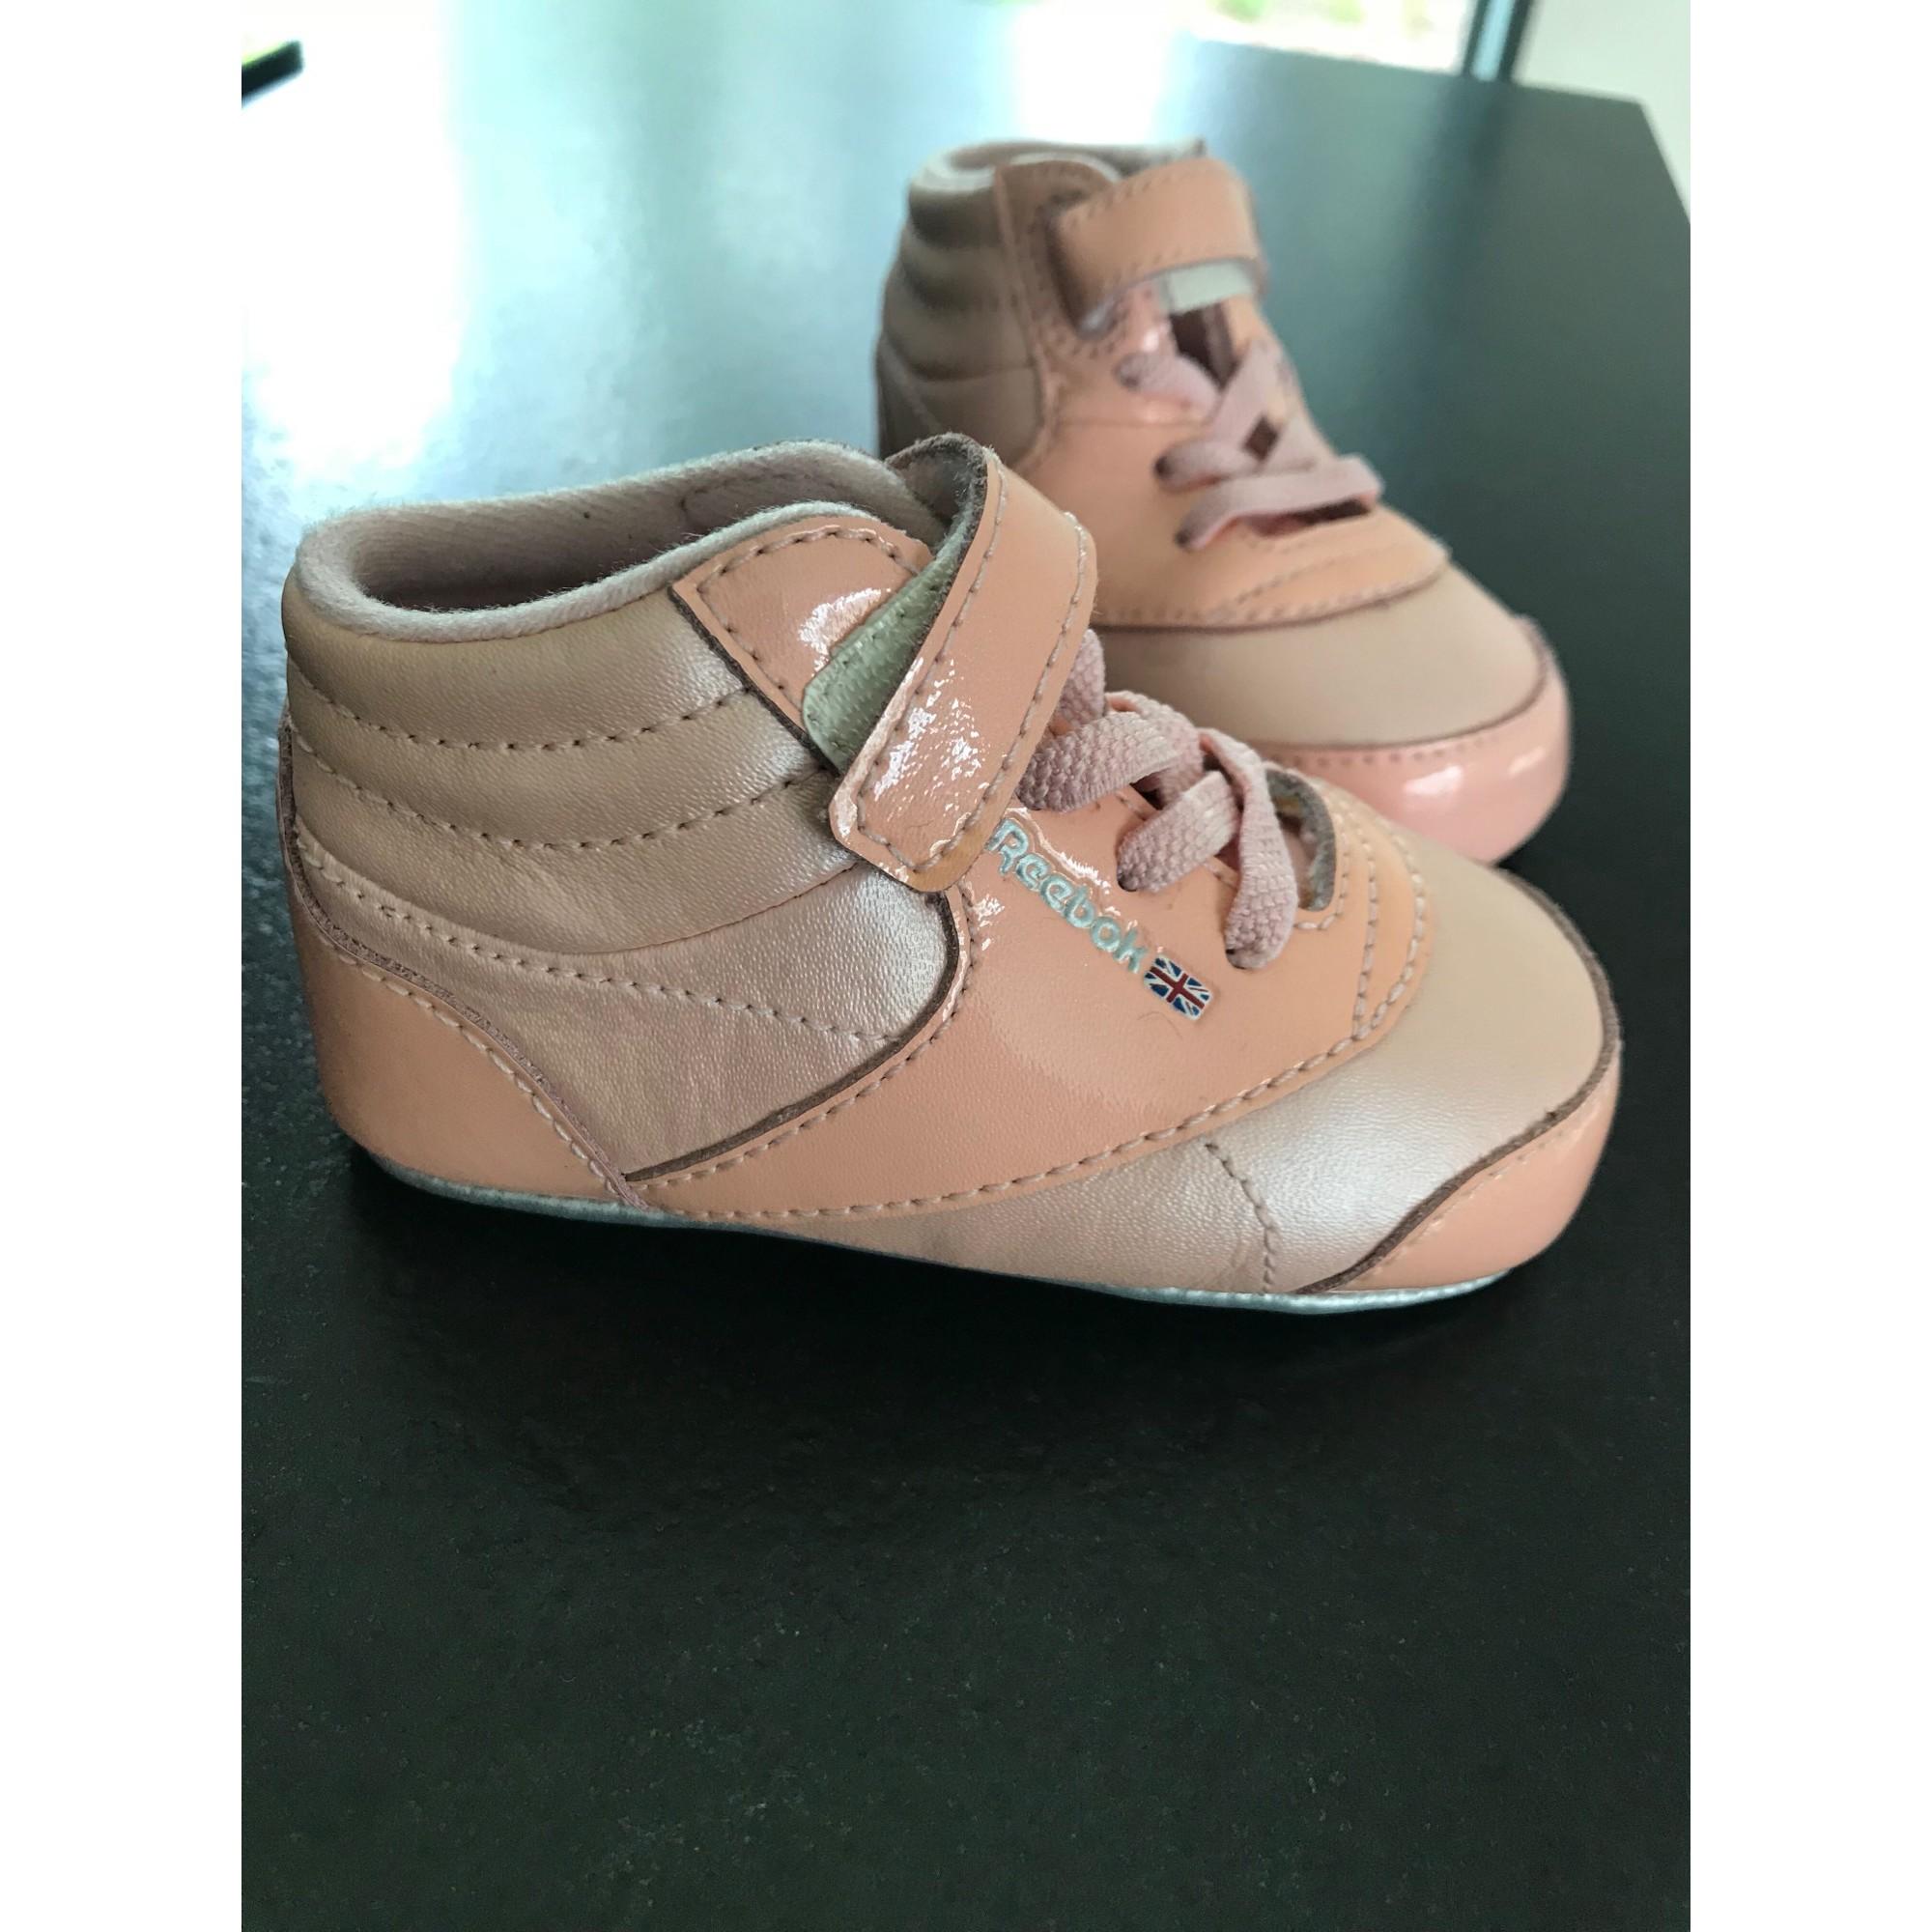 Sneakers REEBOK Pink, fuchsia, light pink